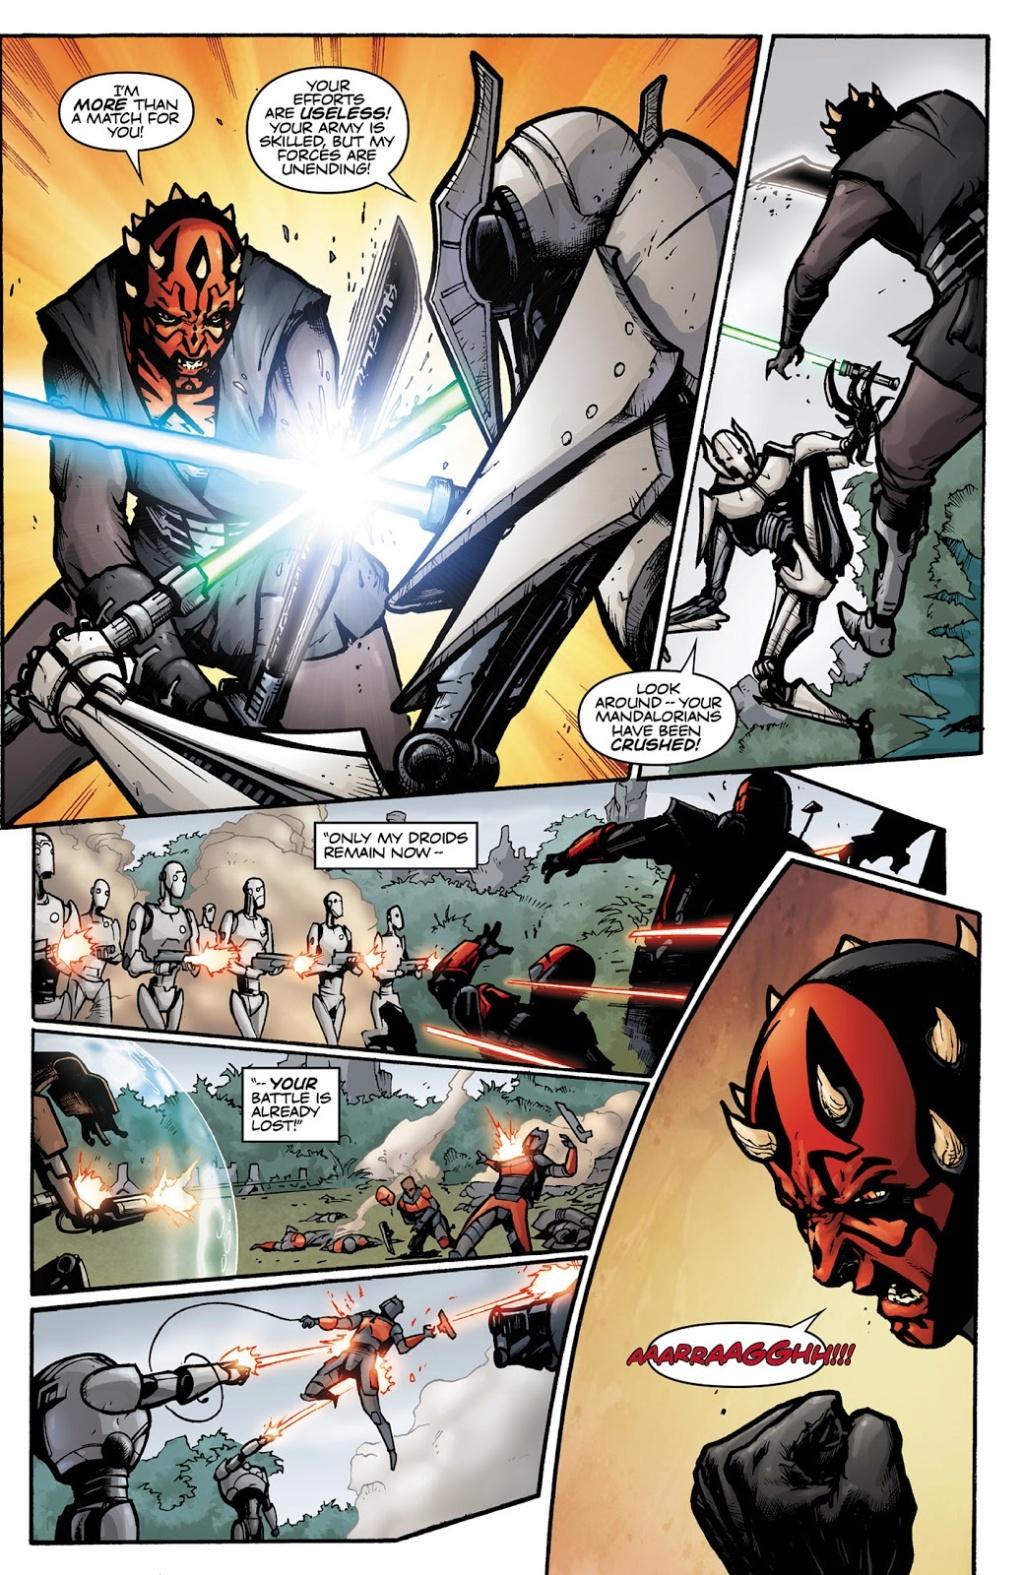 SS - Darth Maul (IG) vs. Darth Vader (BreakofDawn) Rco02111